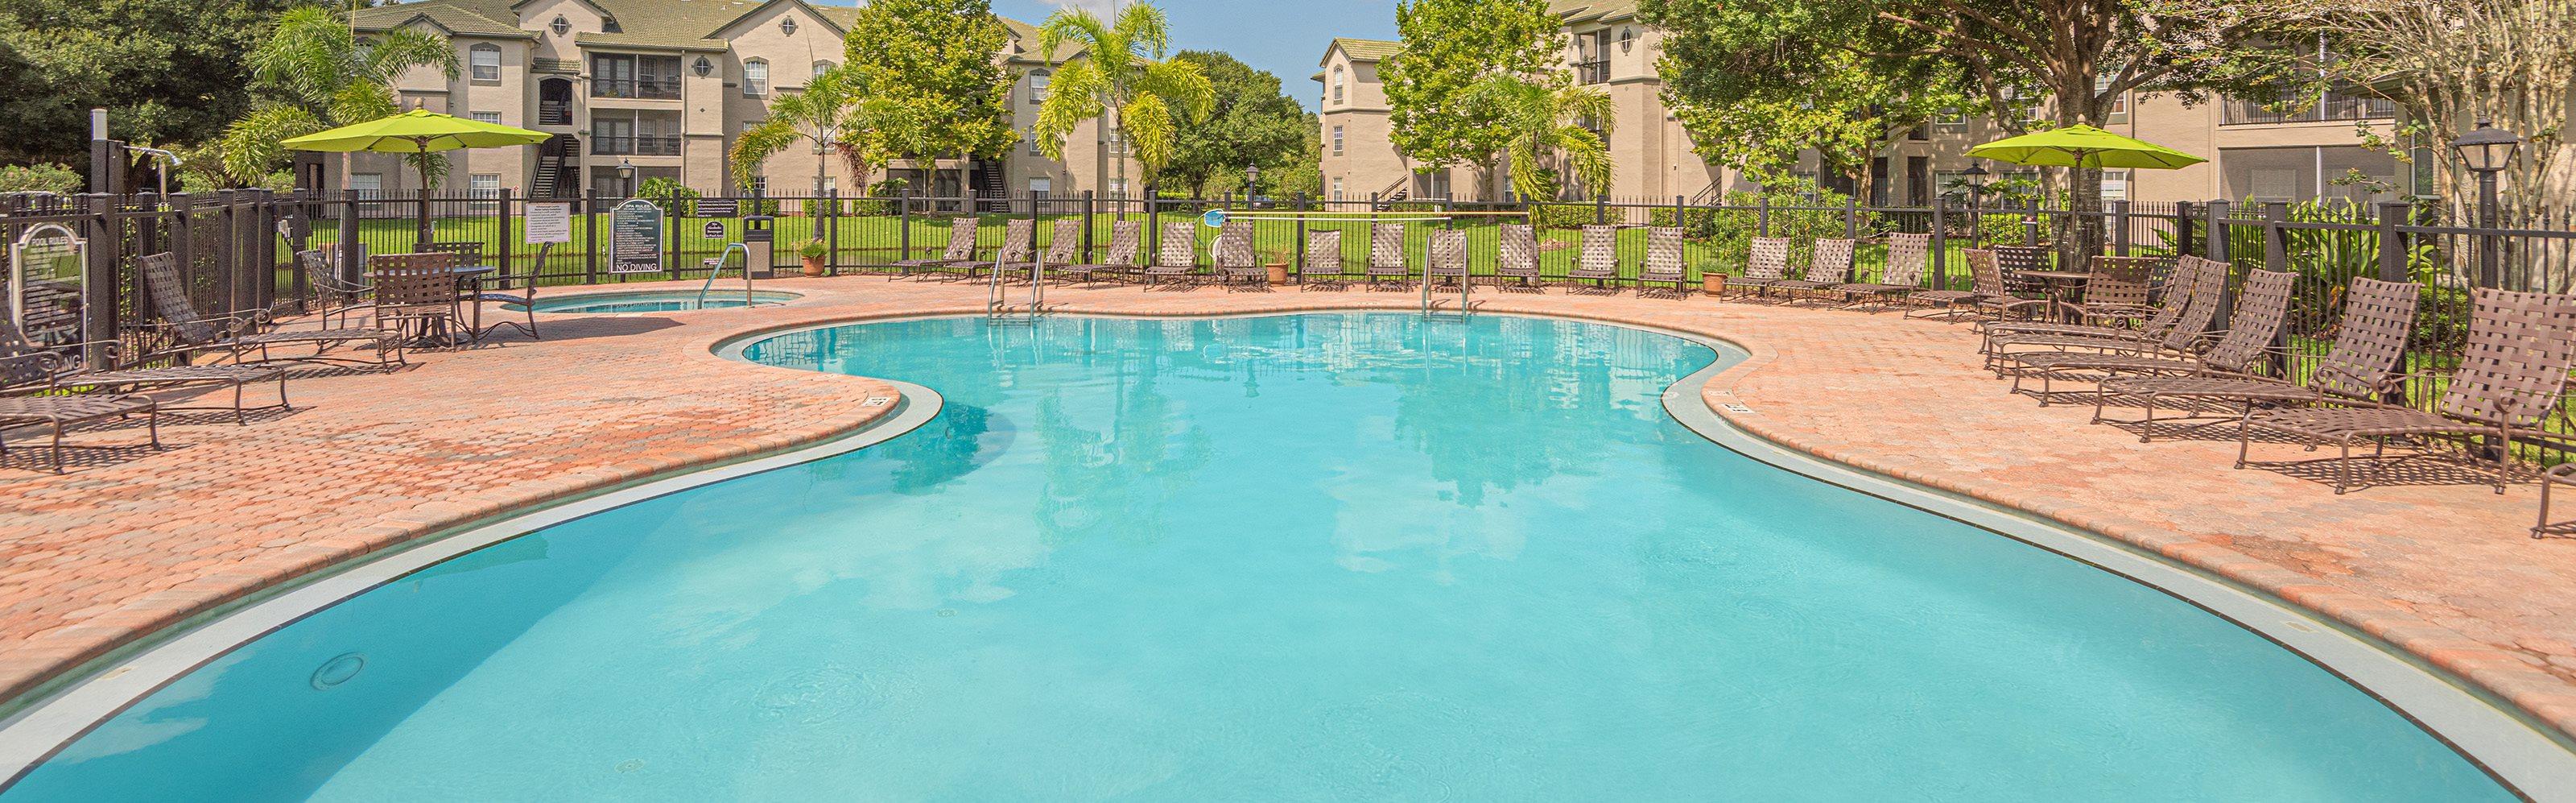 Versant Place Apartments pool area